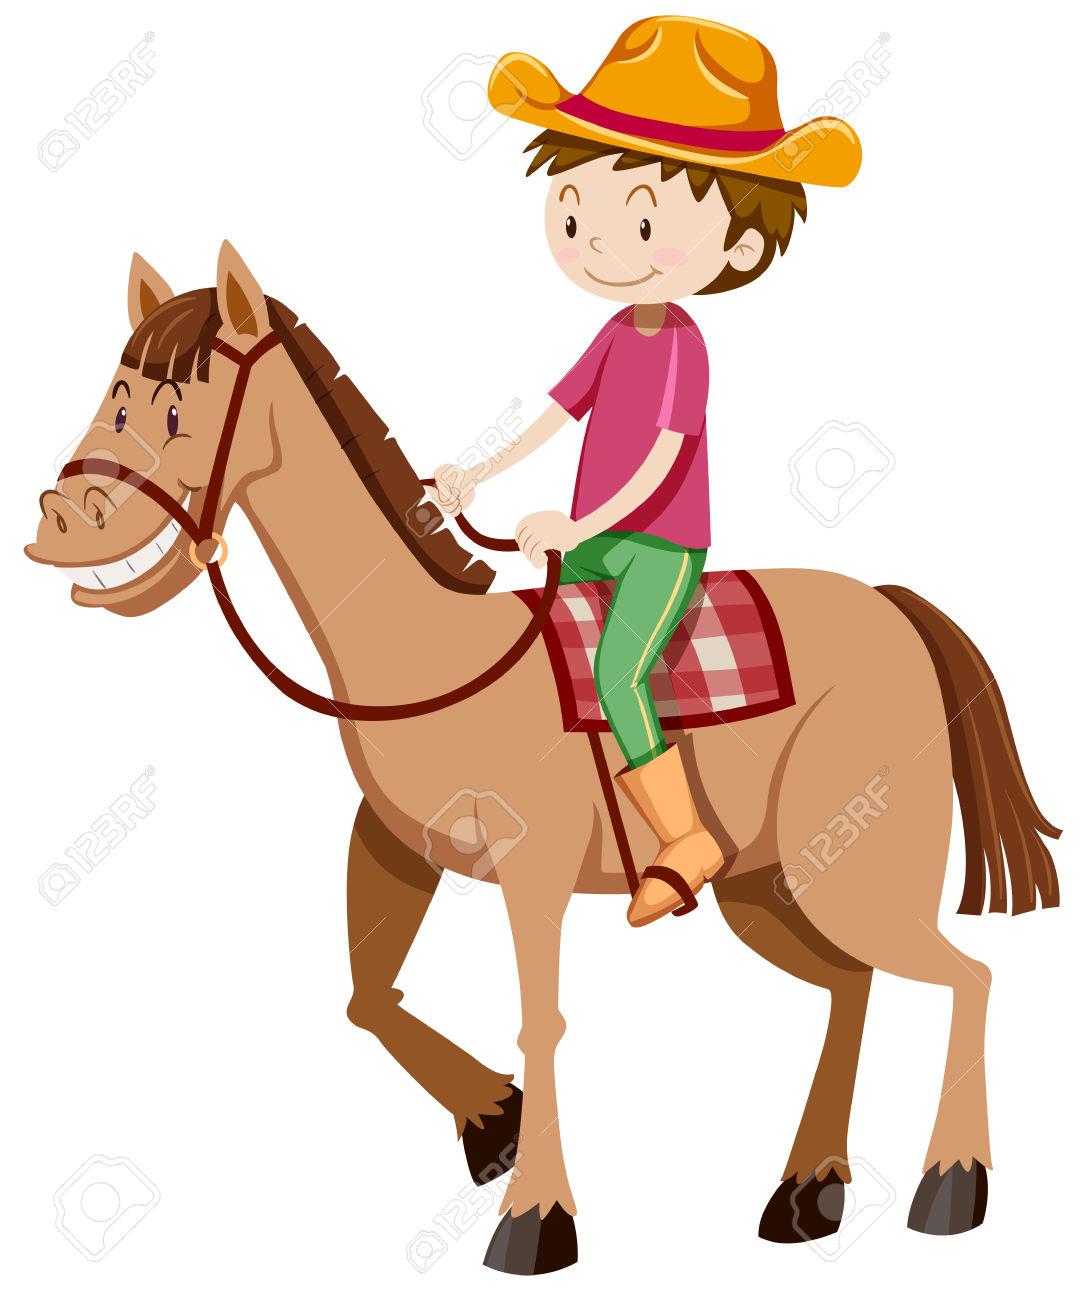 1089x1300 Anime Clipart Horse Rider